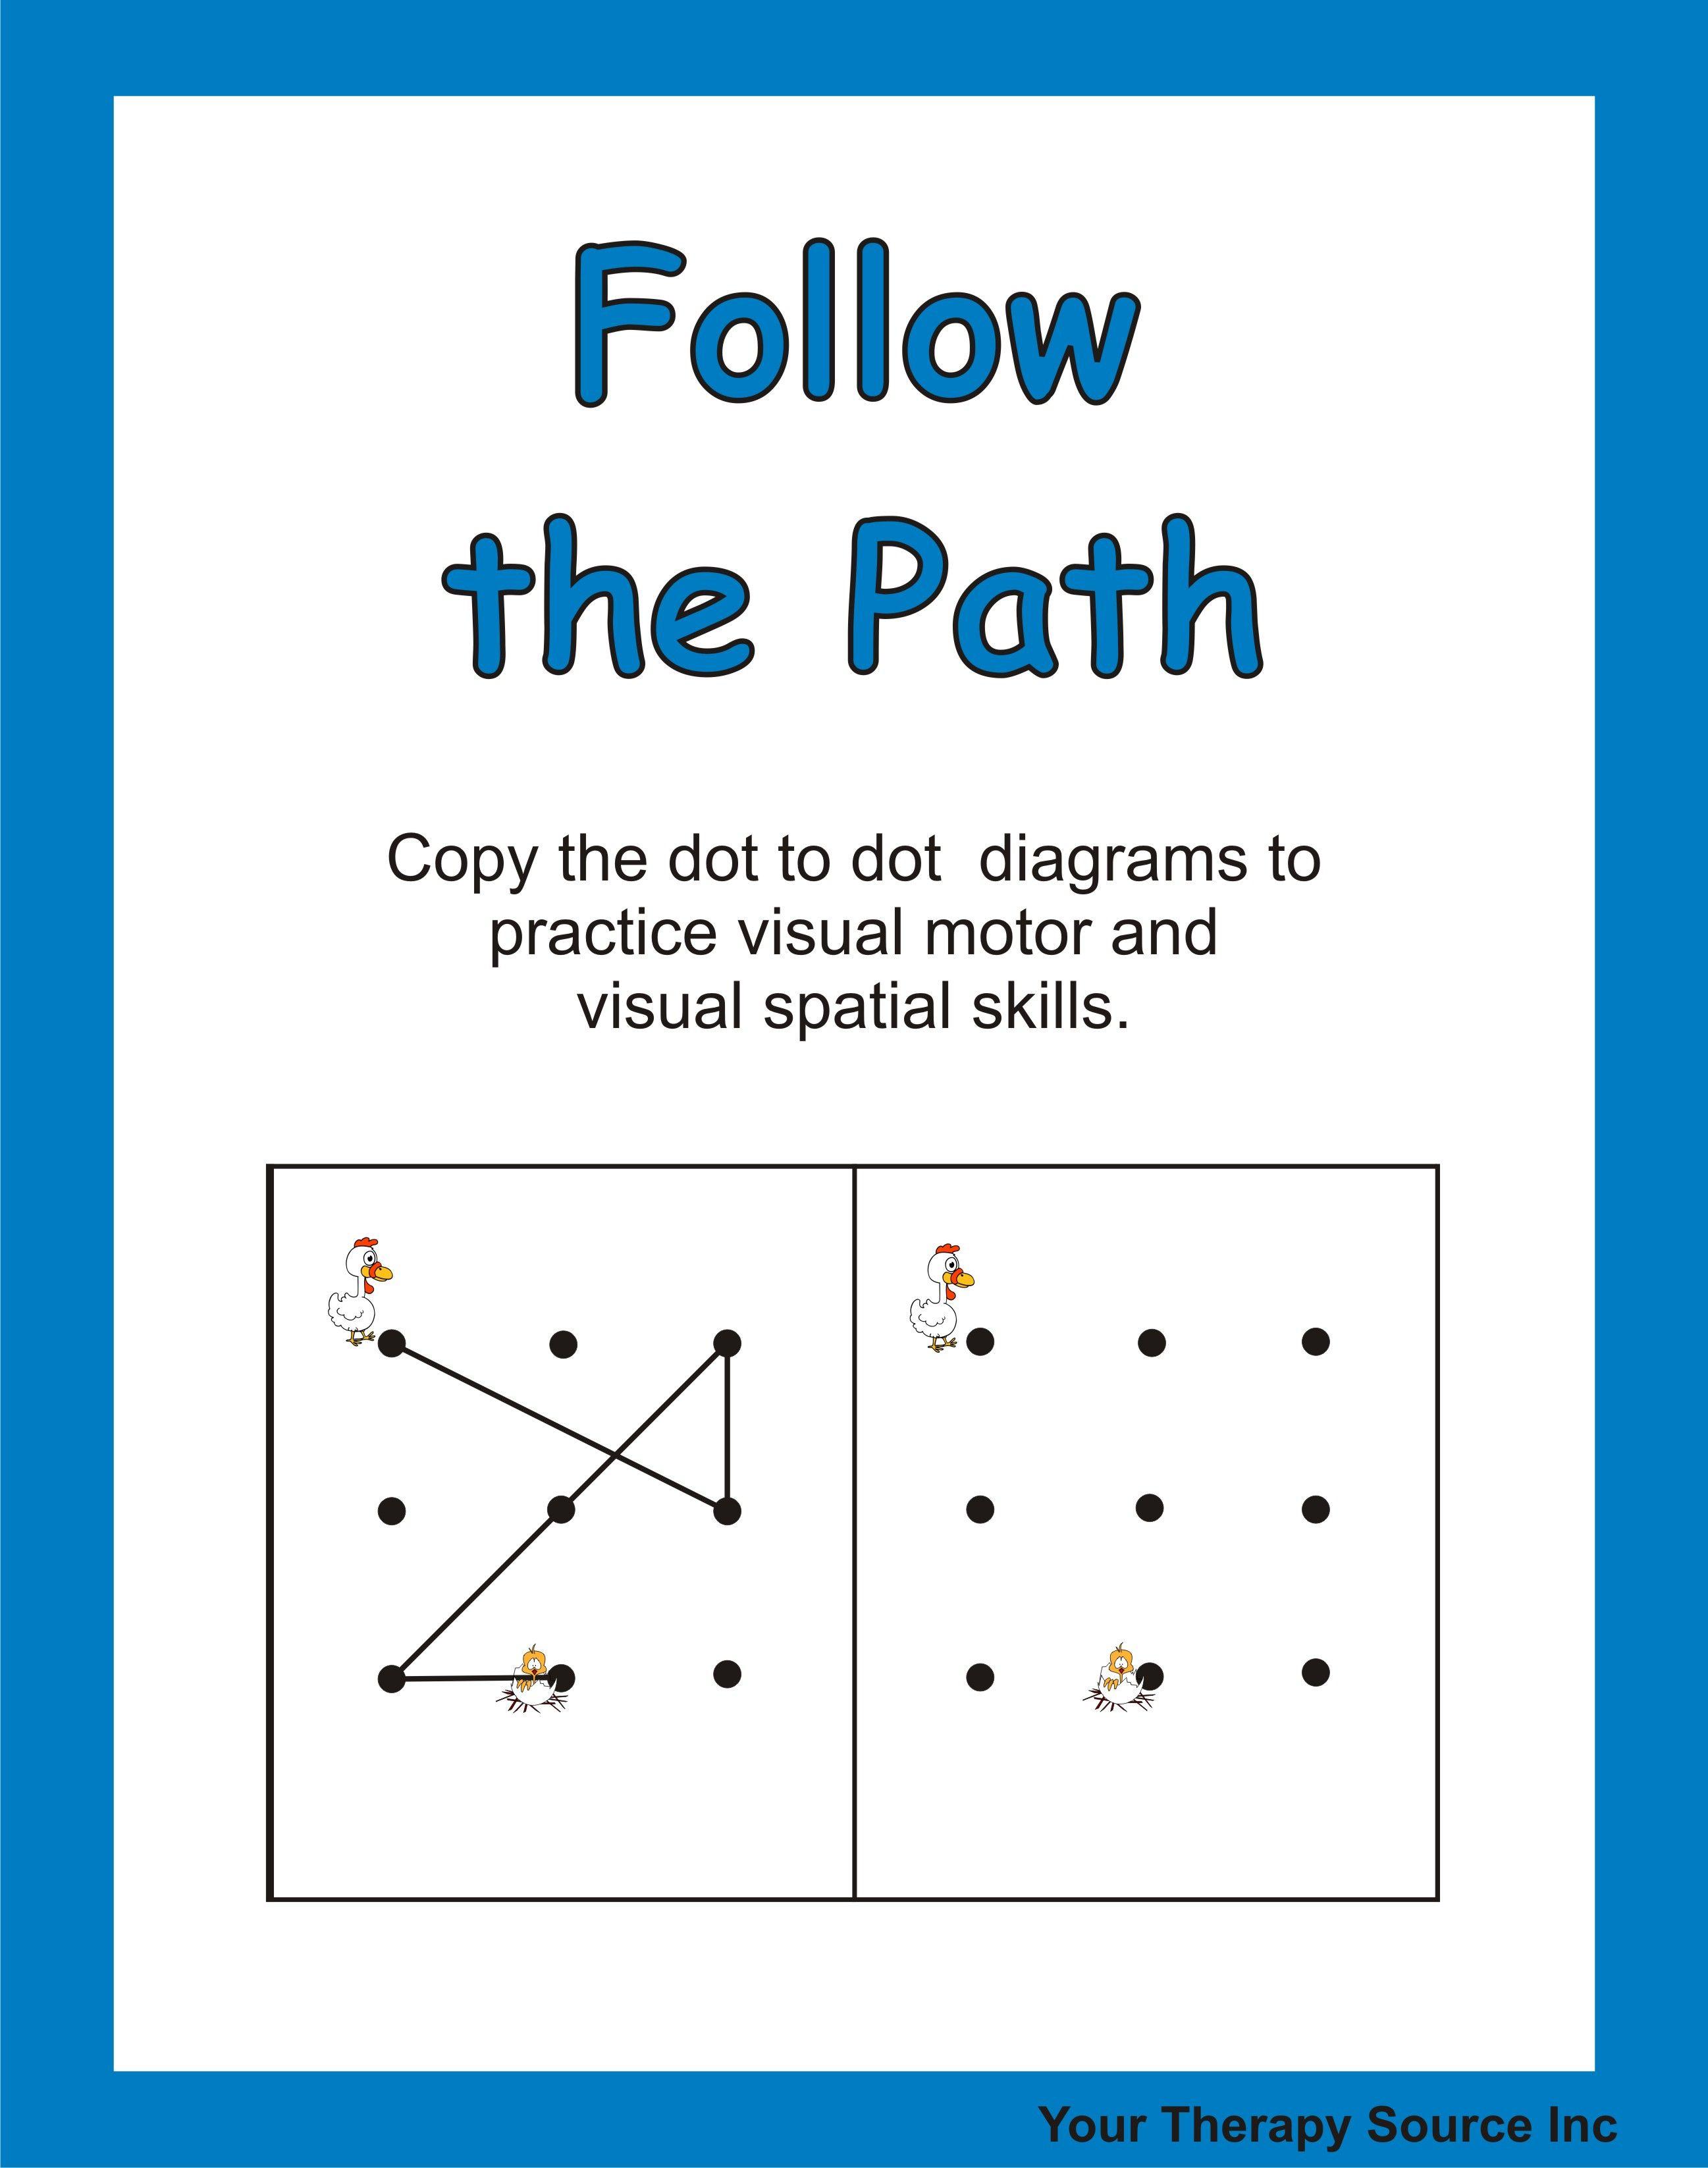 Follow The Path Visual